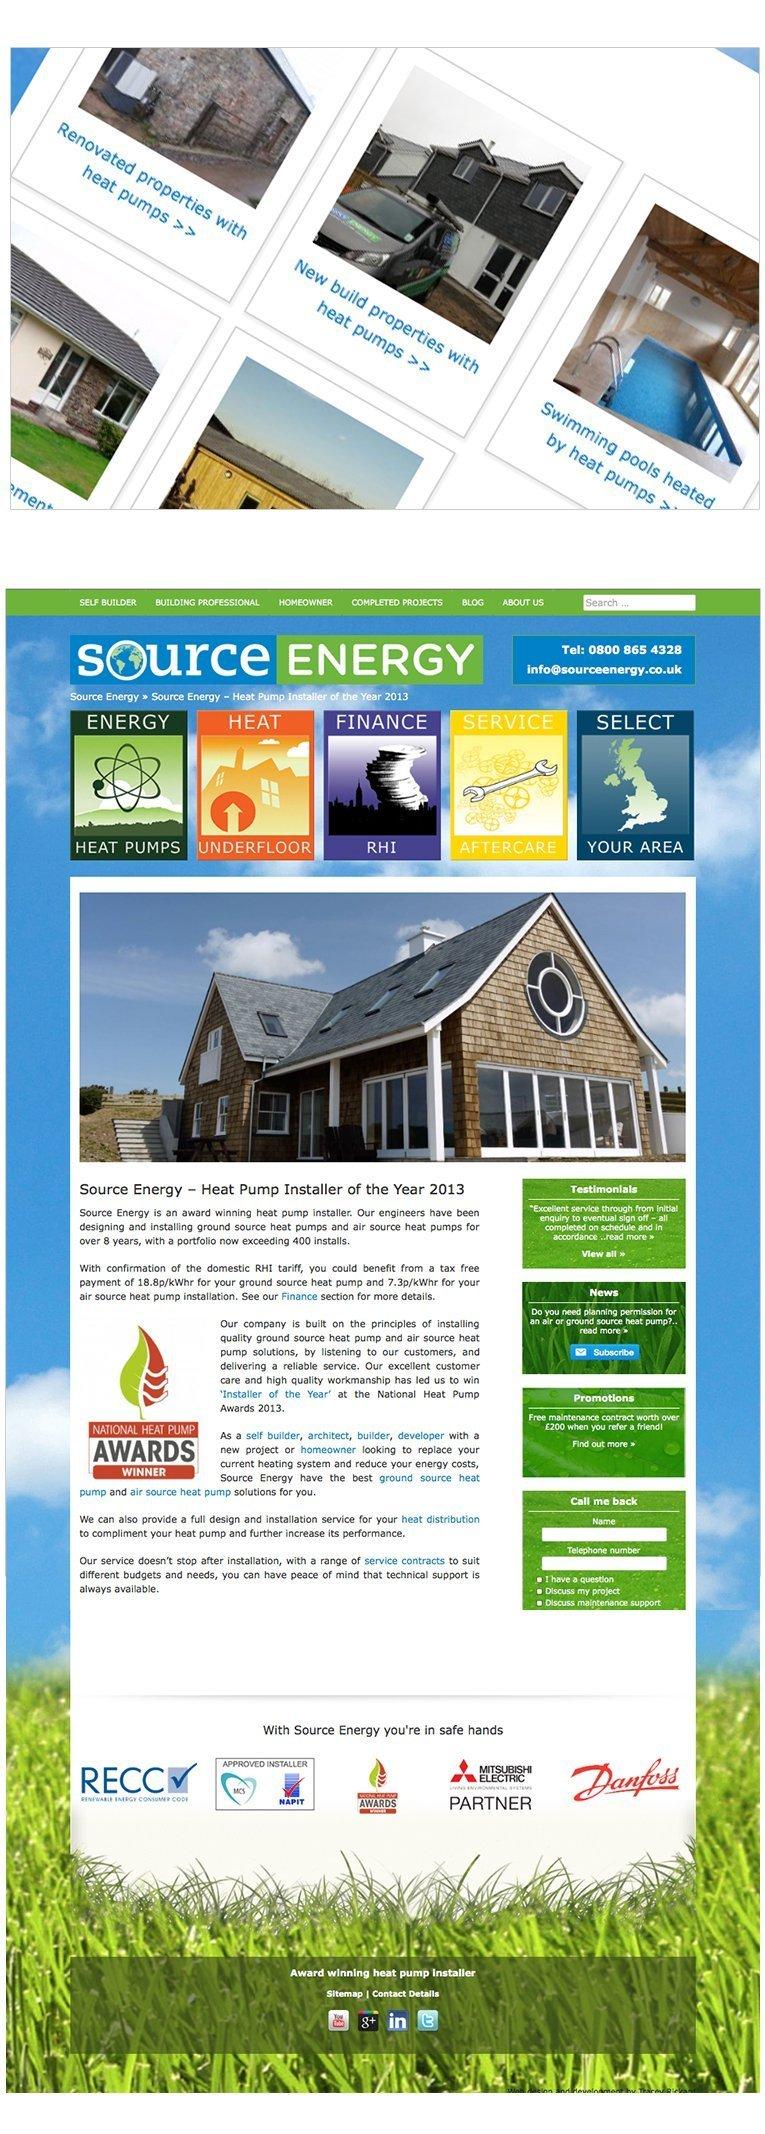 Fully Responisve Website by Web Designer Cornwall